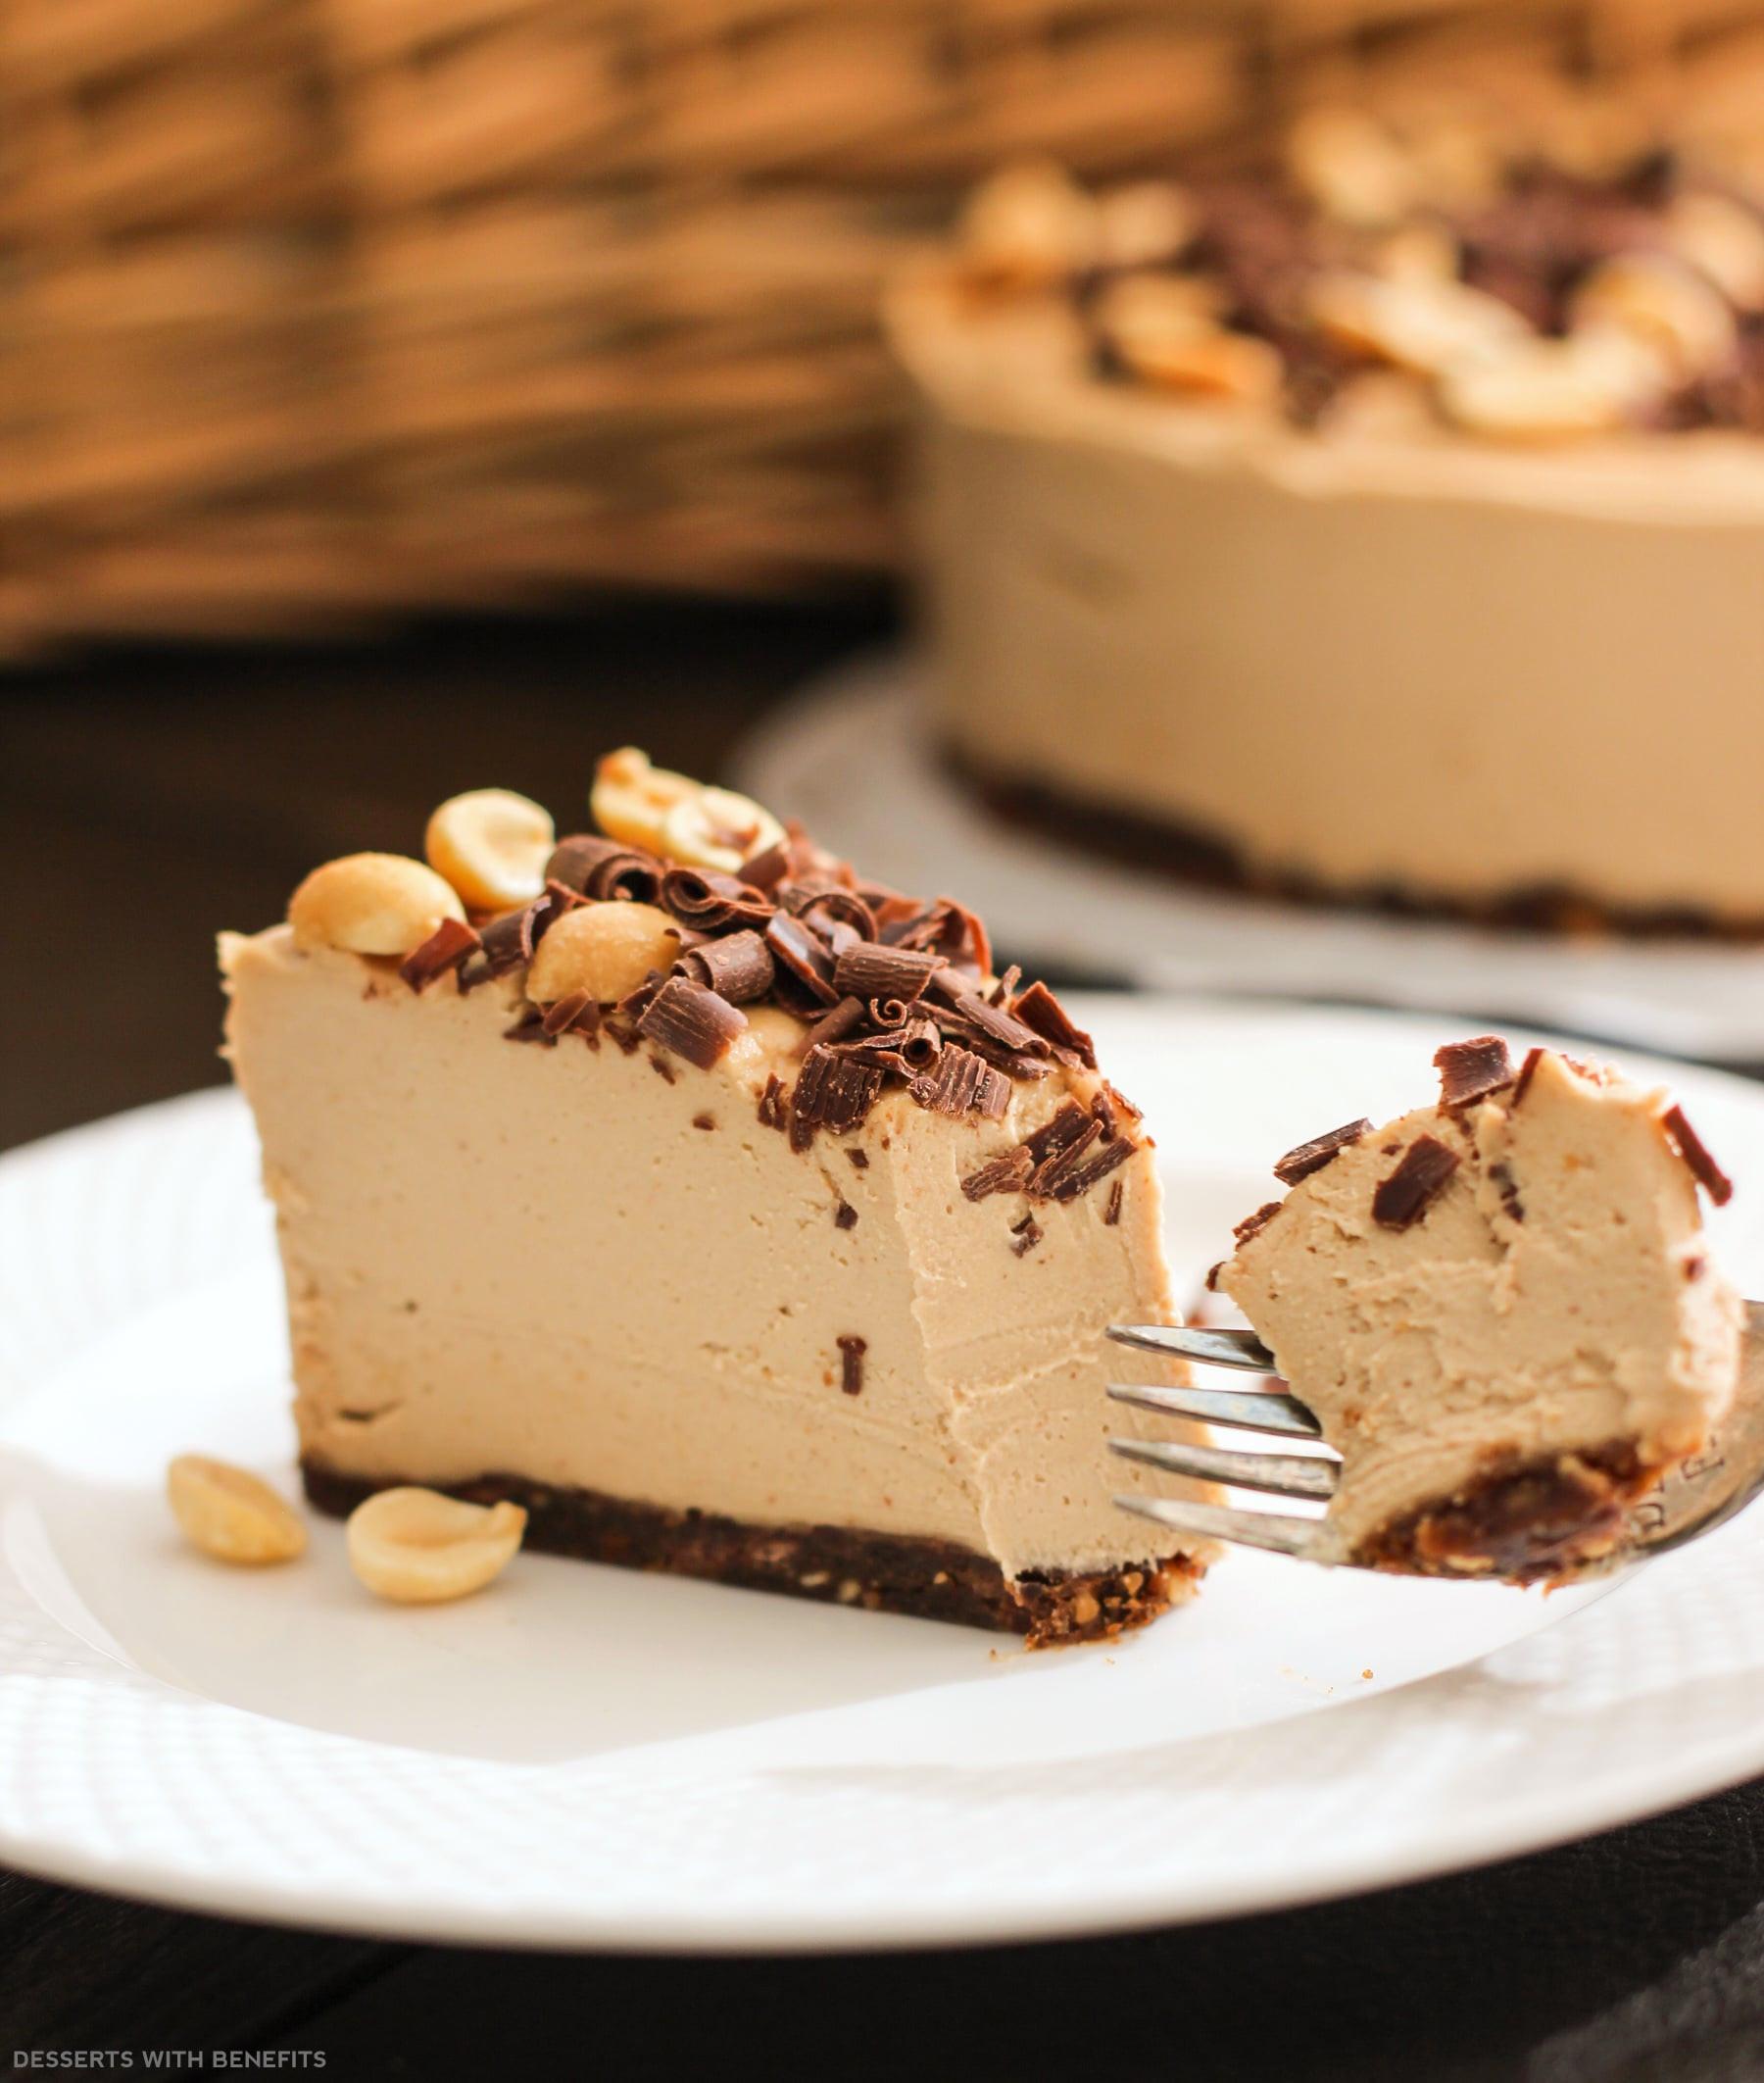 Sugar Free Dairy Free Desserts  Desserts With Benefits Healthy Chocolate Peanut Butter Raw